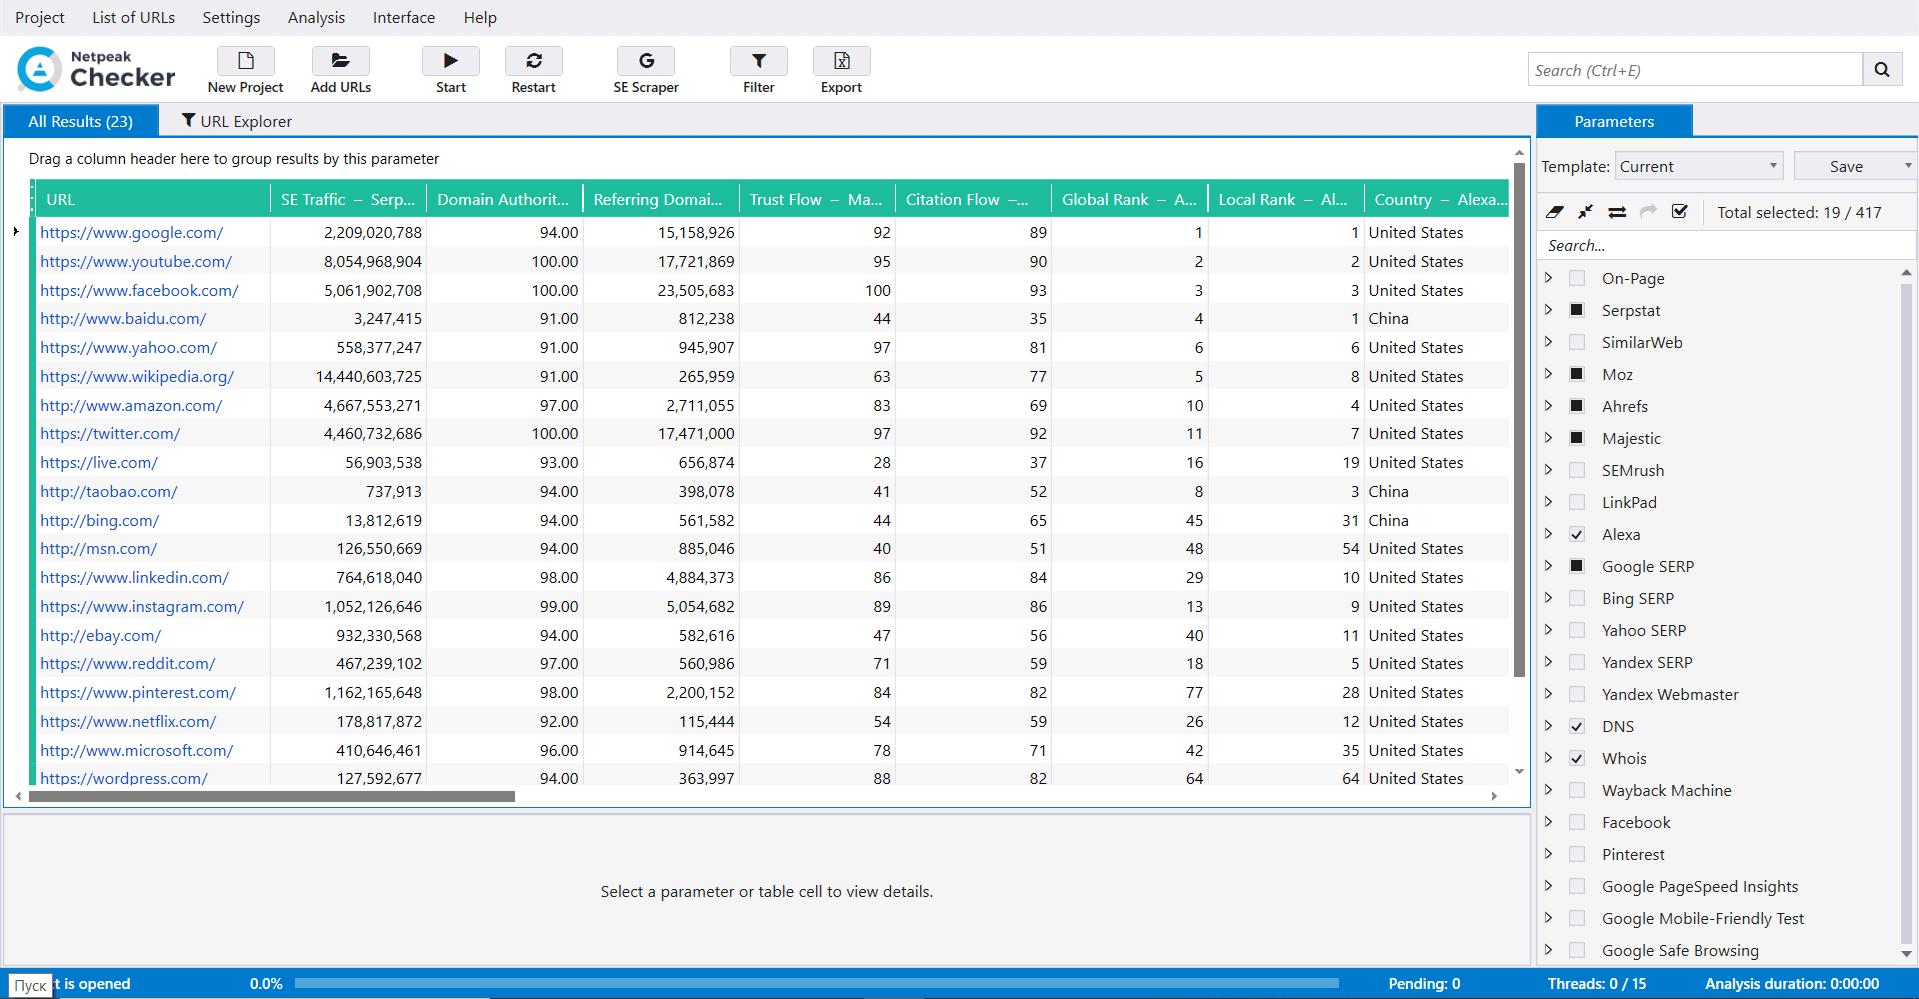 Result of the key metrics analysis in Netpeak Checker